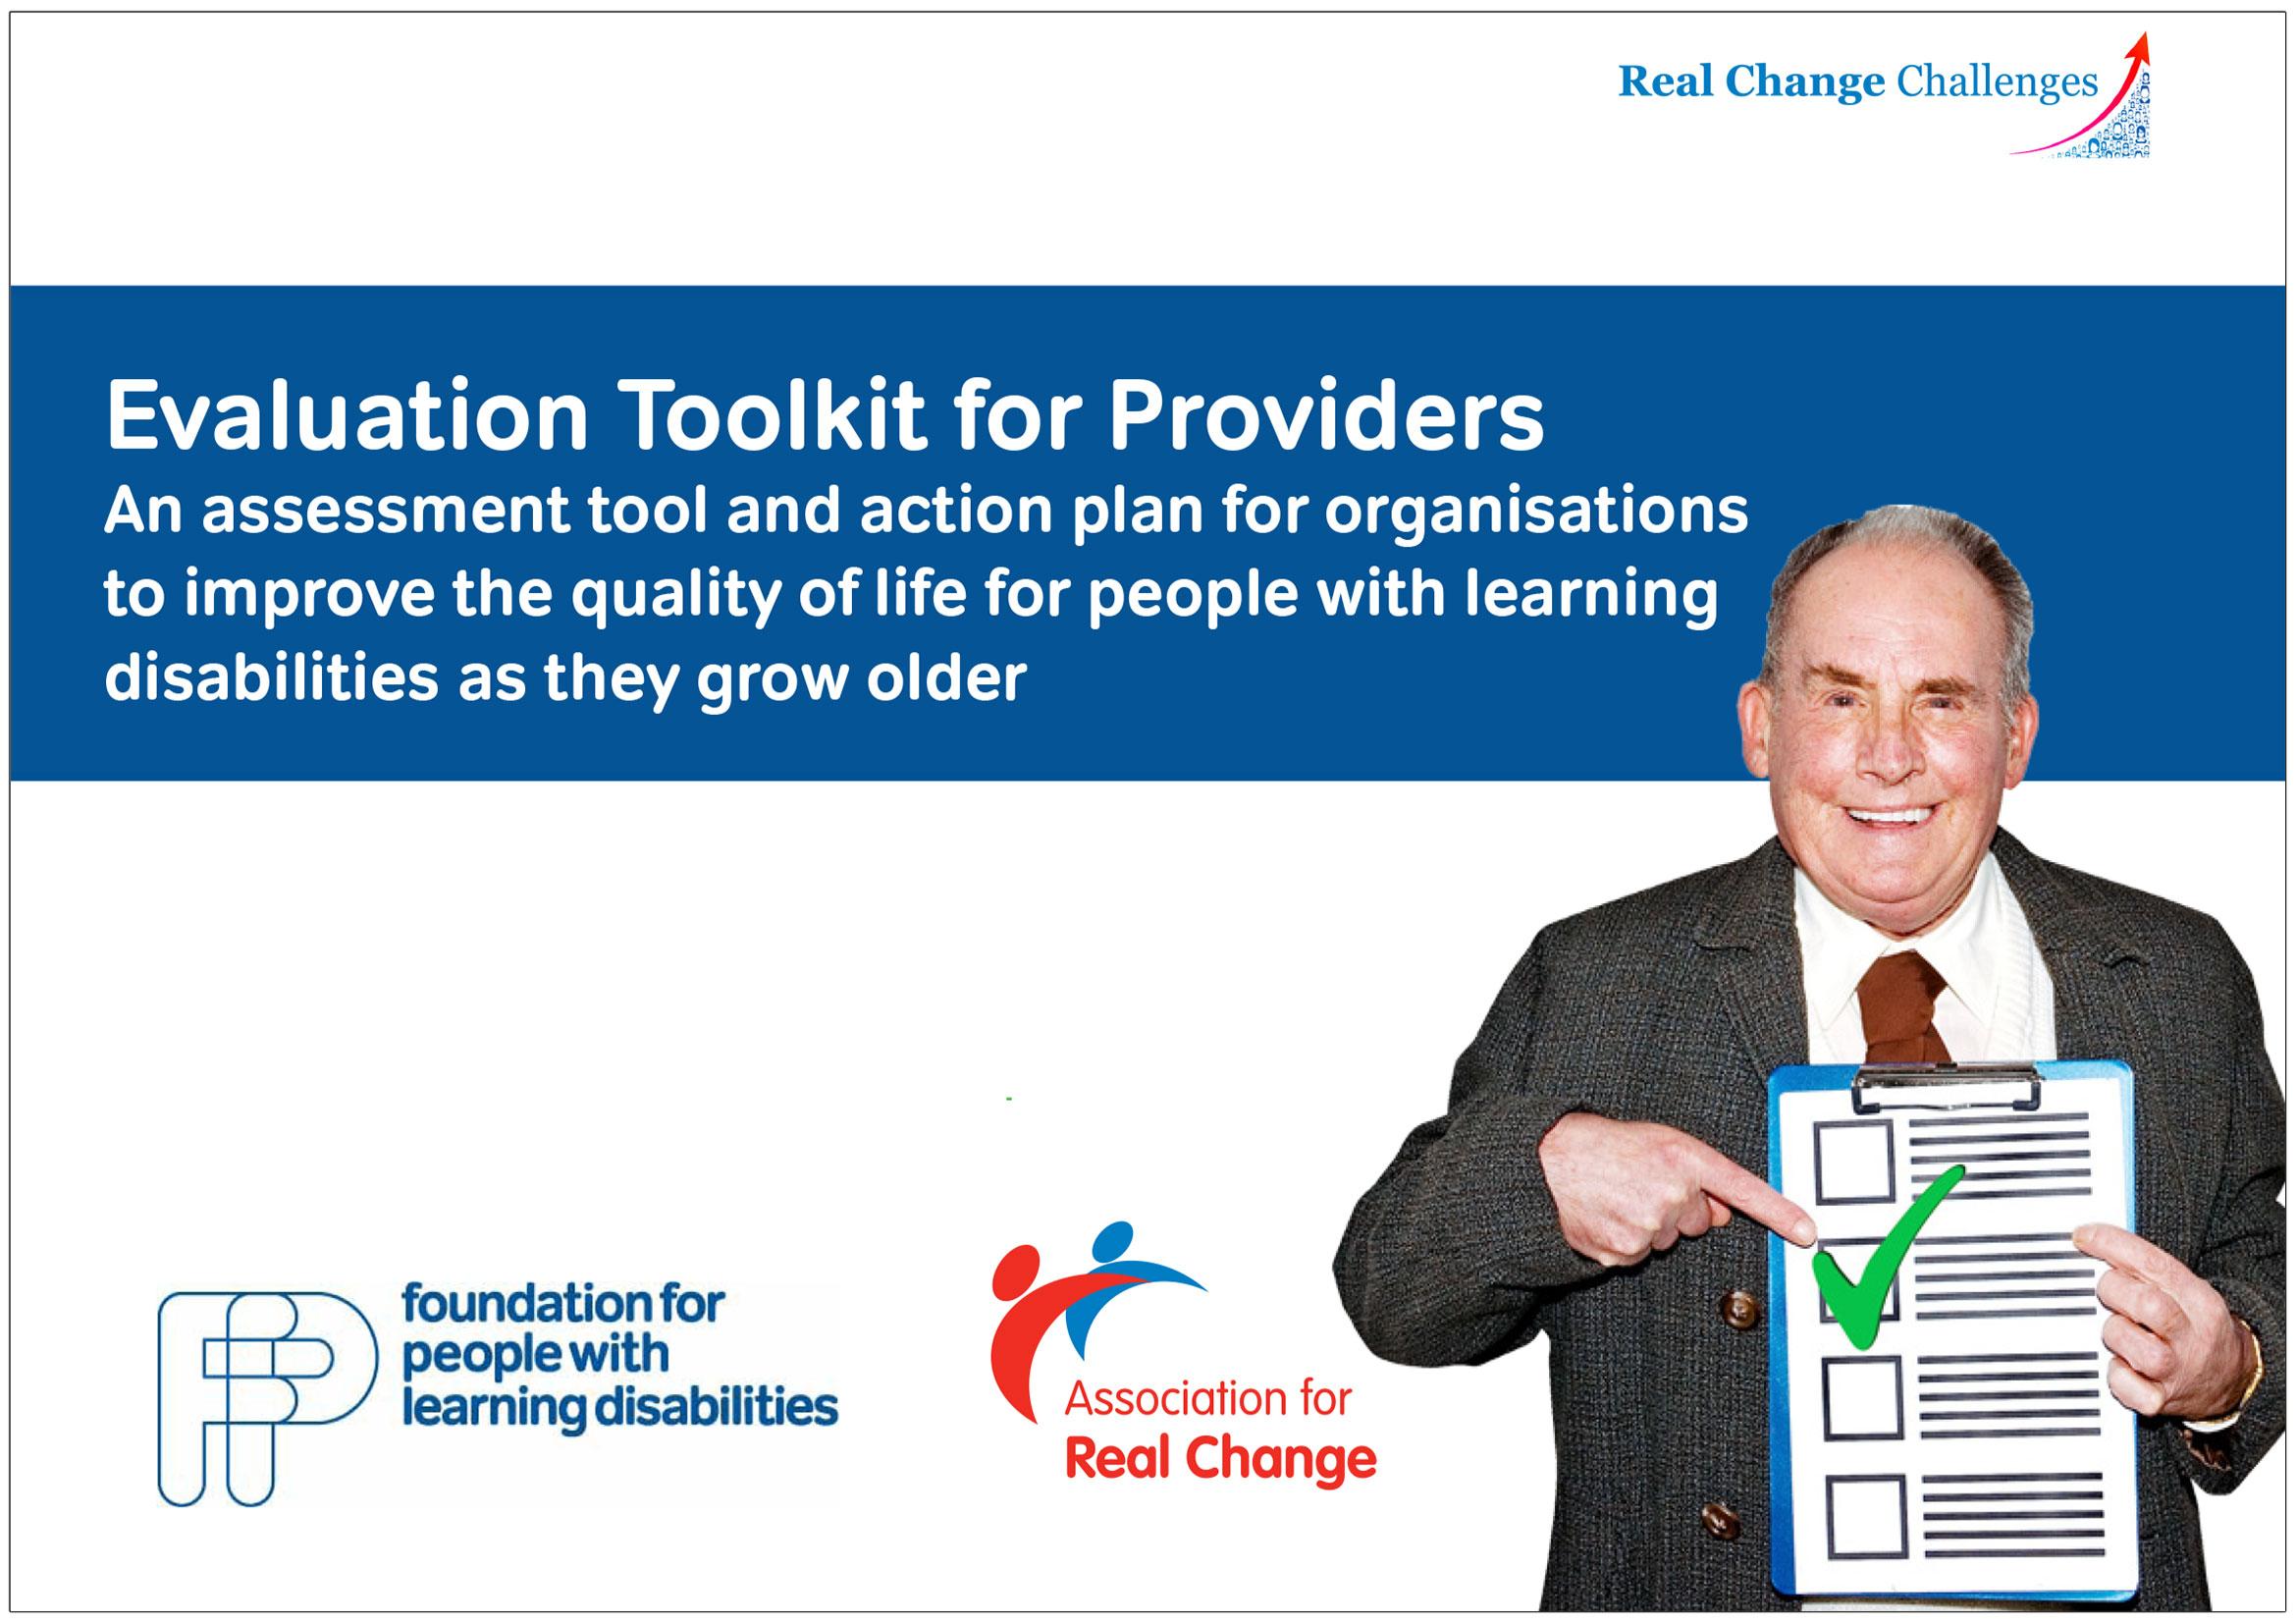 Growing Older Evaluation Toolkit